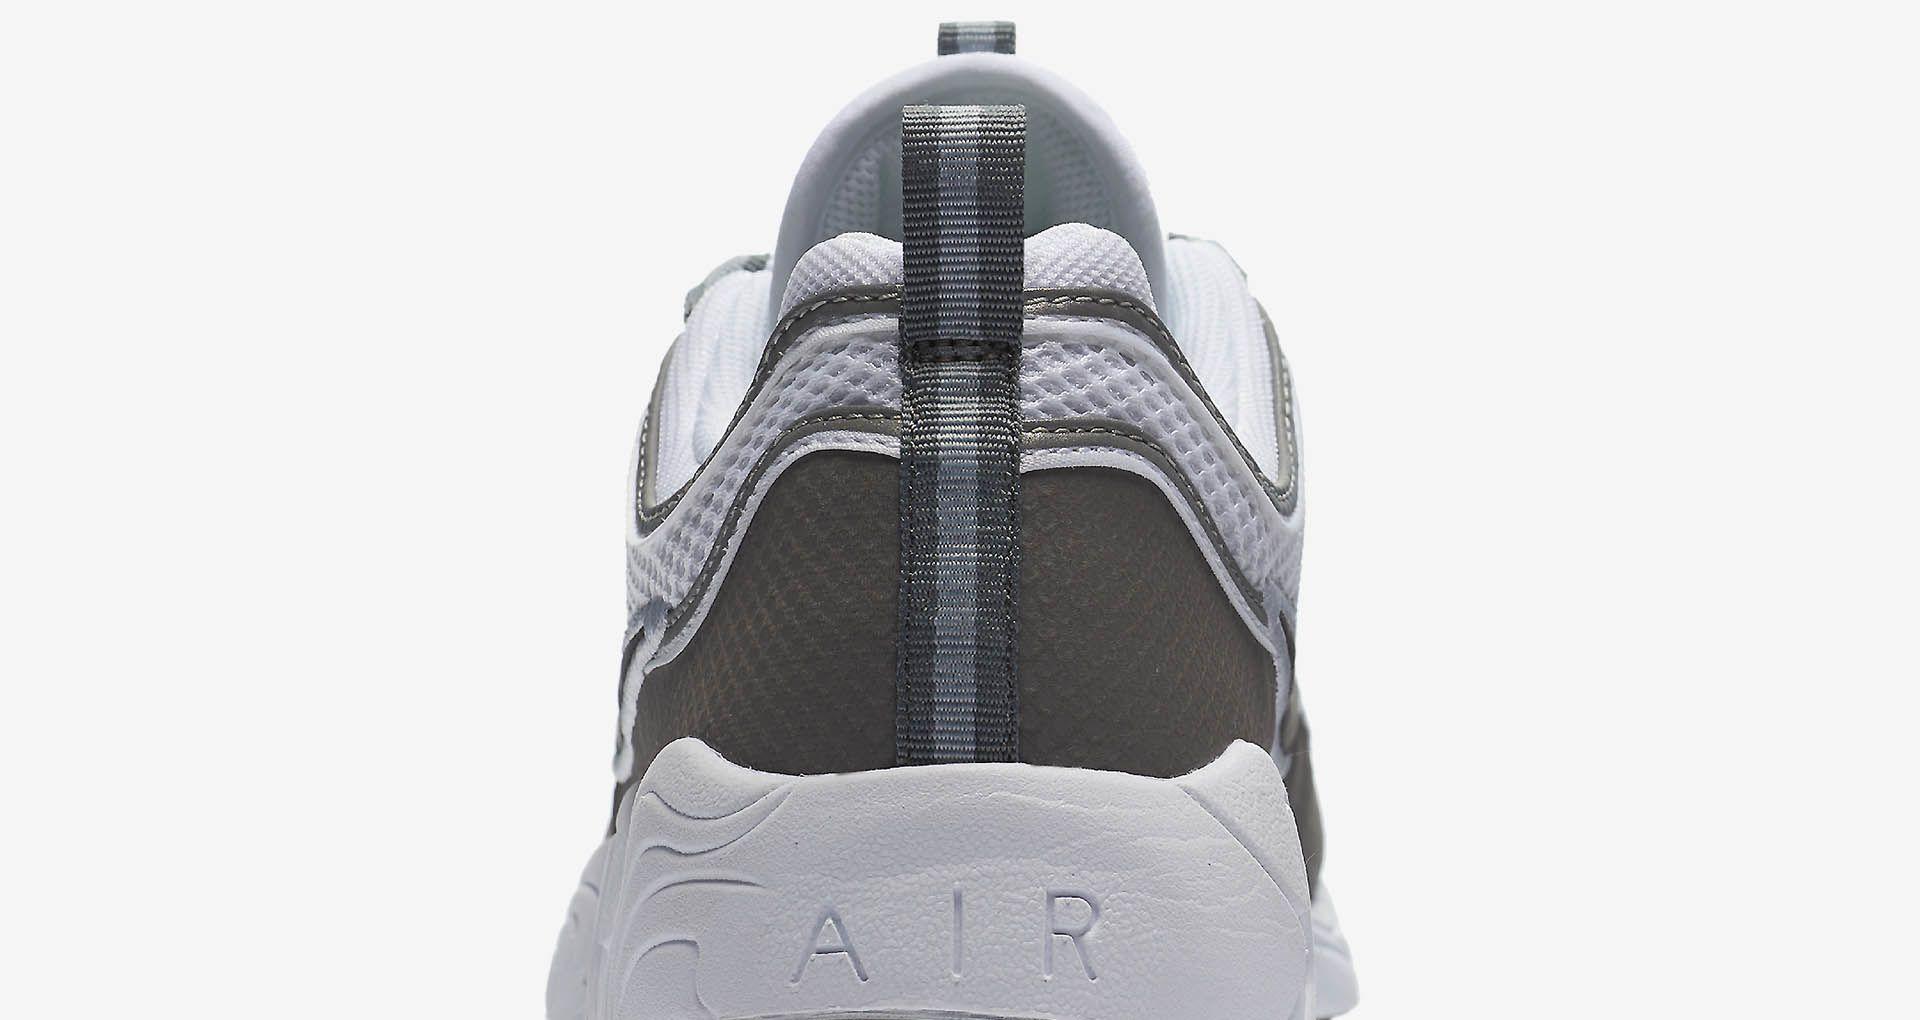 78eba06fb848 Nike Air Zoom Spiridon  White   Light Ash . Nike+ SNKRS